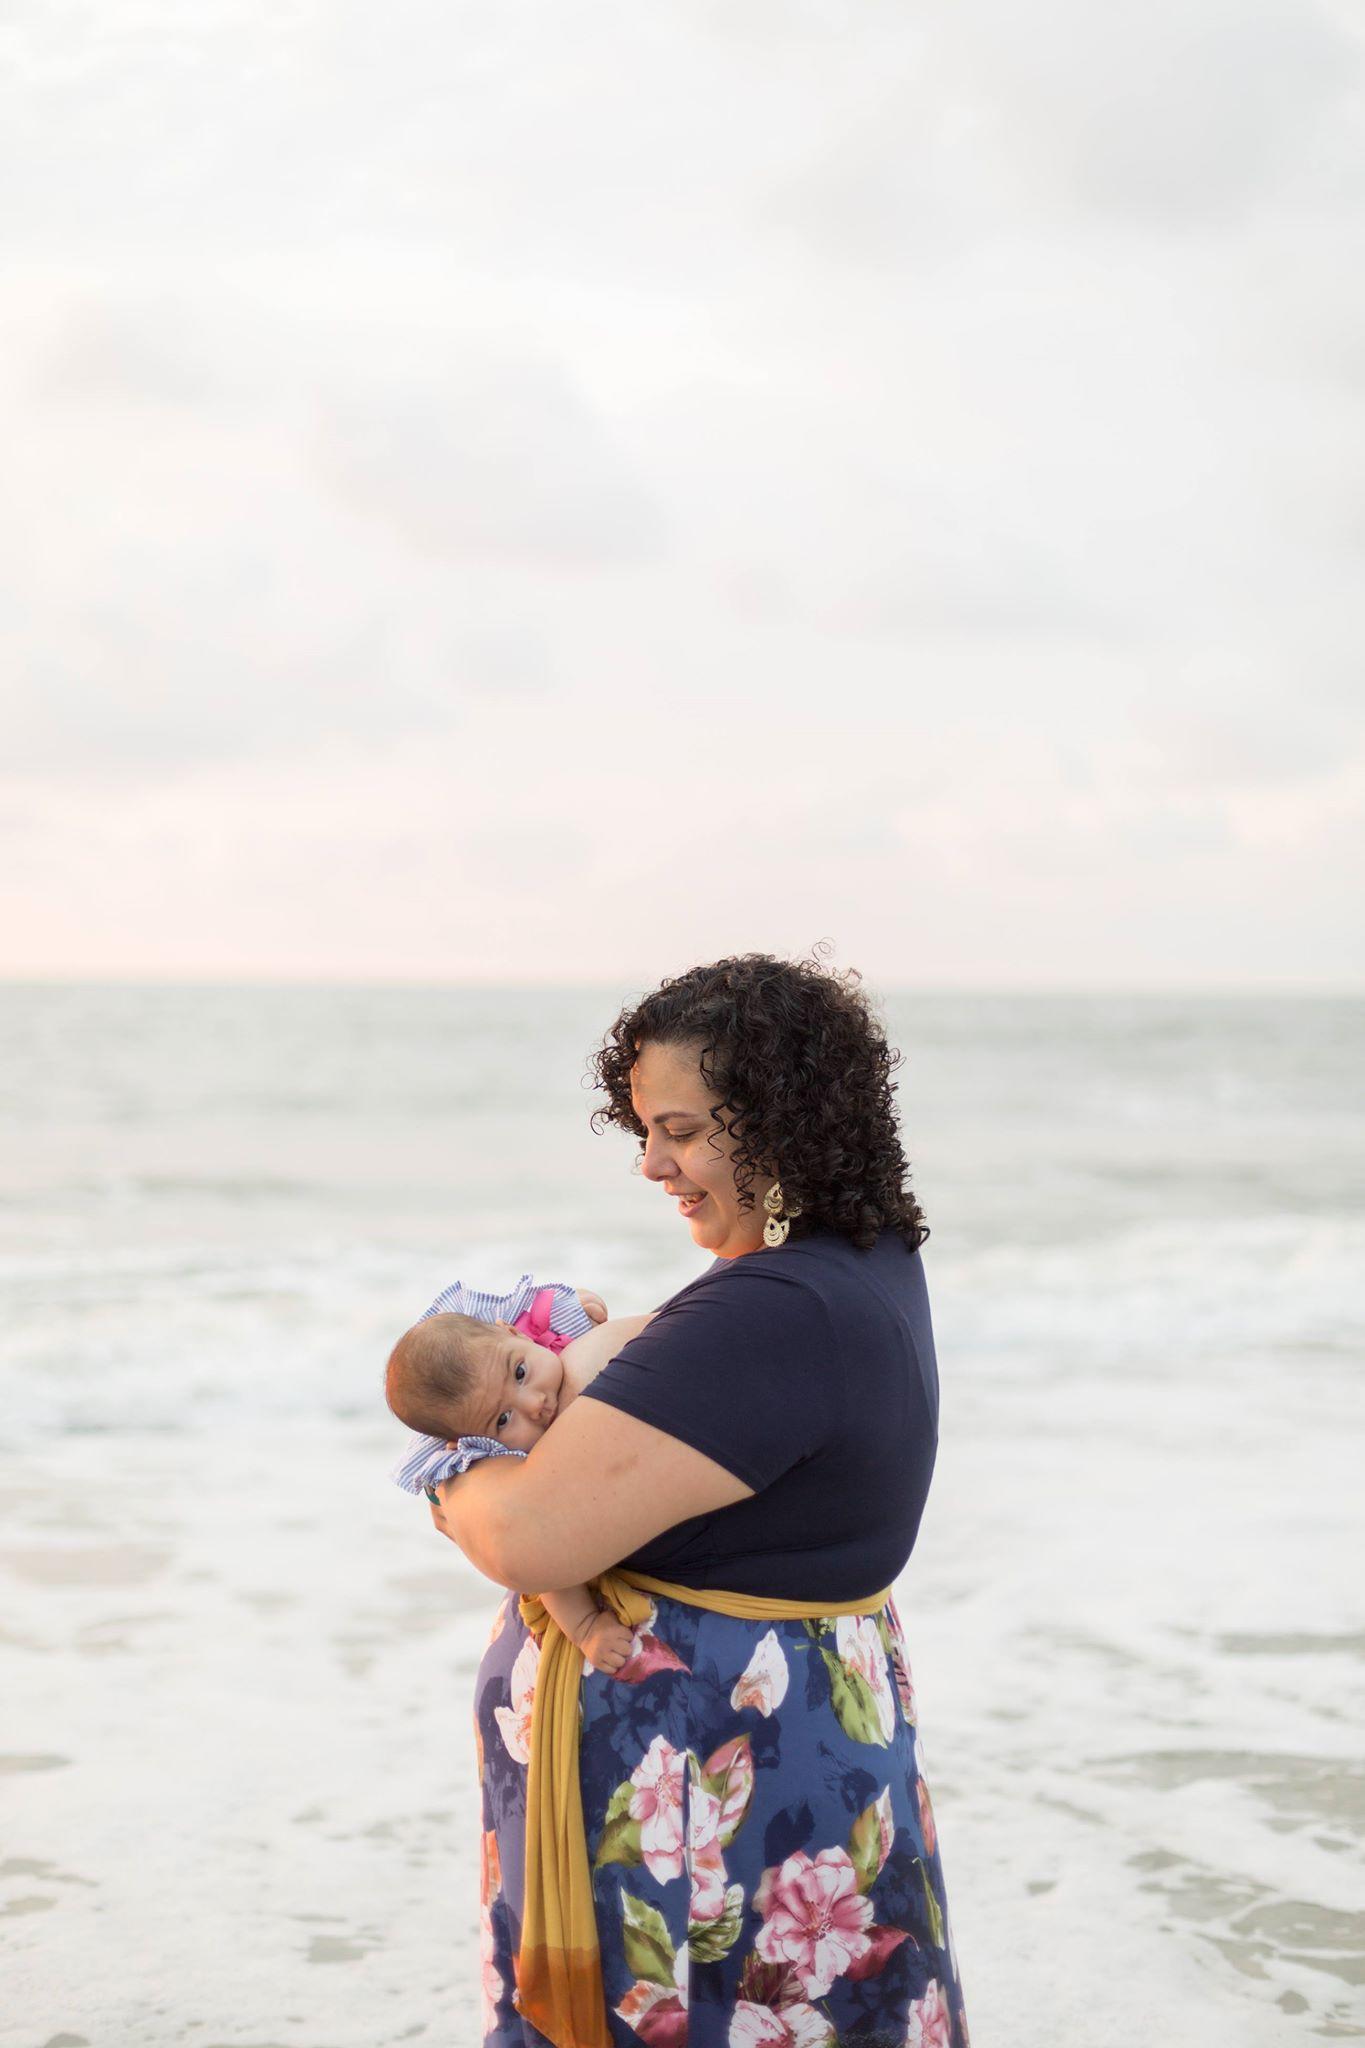 Nursing Benefits for Mom